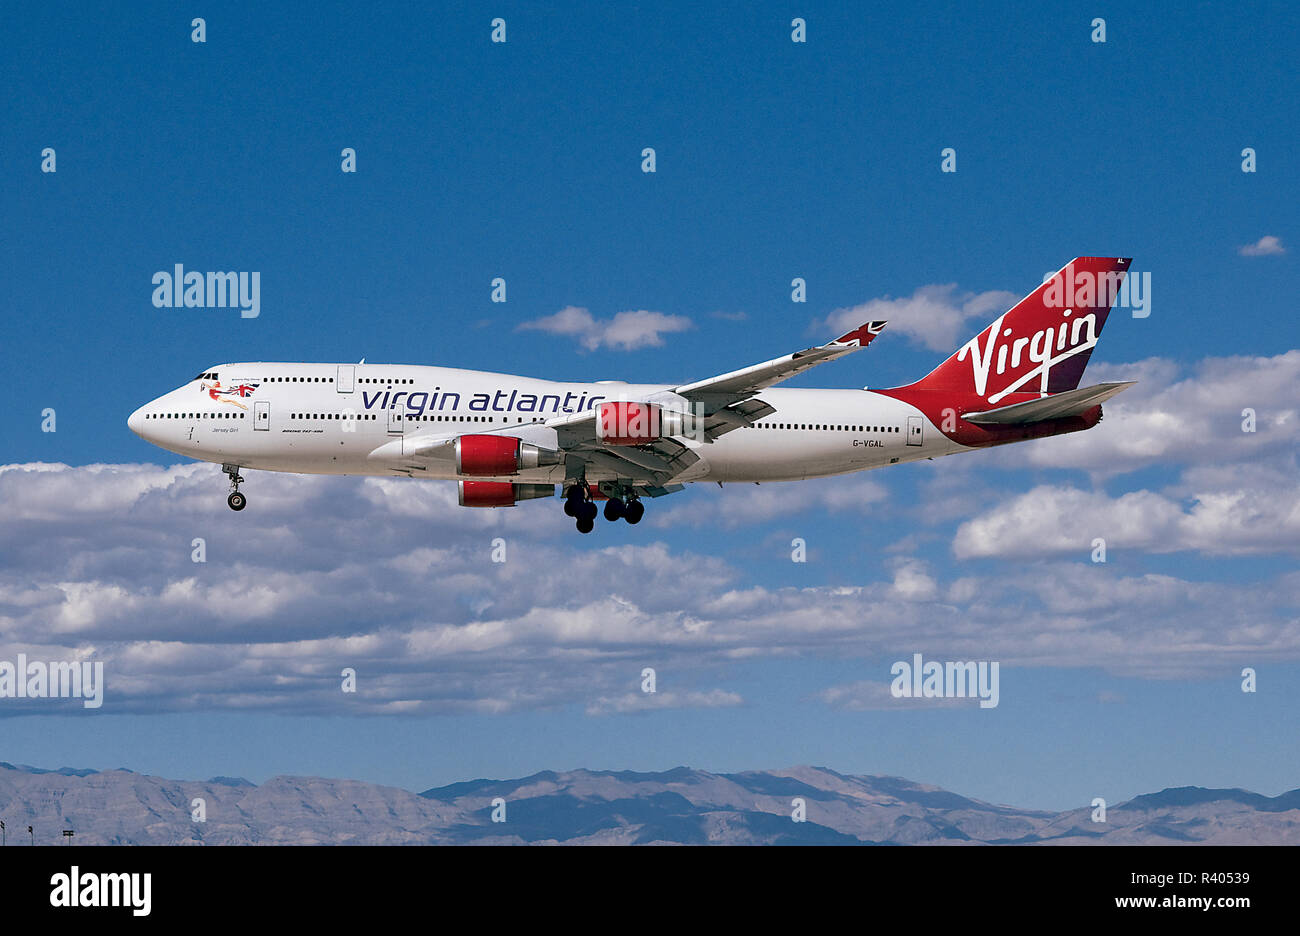 Virgin Atlantic Beoeing 747 Jumbo Jet Flying beneath a Beautiful Sky Stock Photo